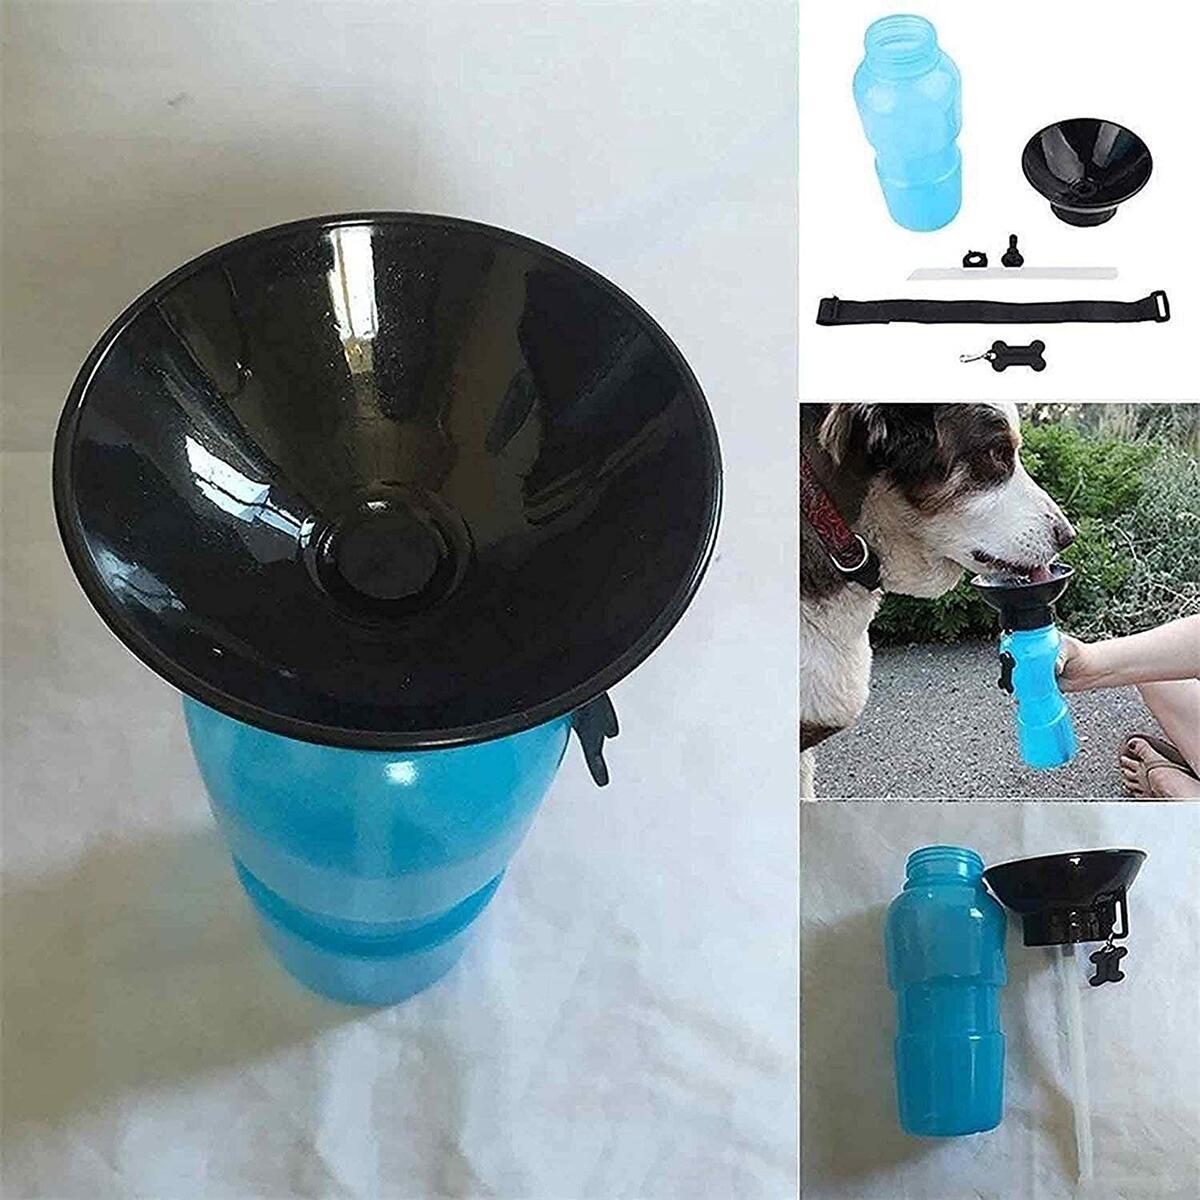 JHR Products Auto Dog Mug Squeeze Water Bottle. Easy Dispensing Pet Travel Mug. Pet Hiking Water Bottle No Mess Fresh Drinking Water Dispensing